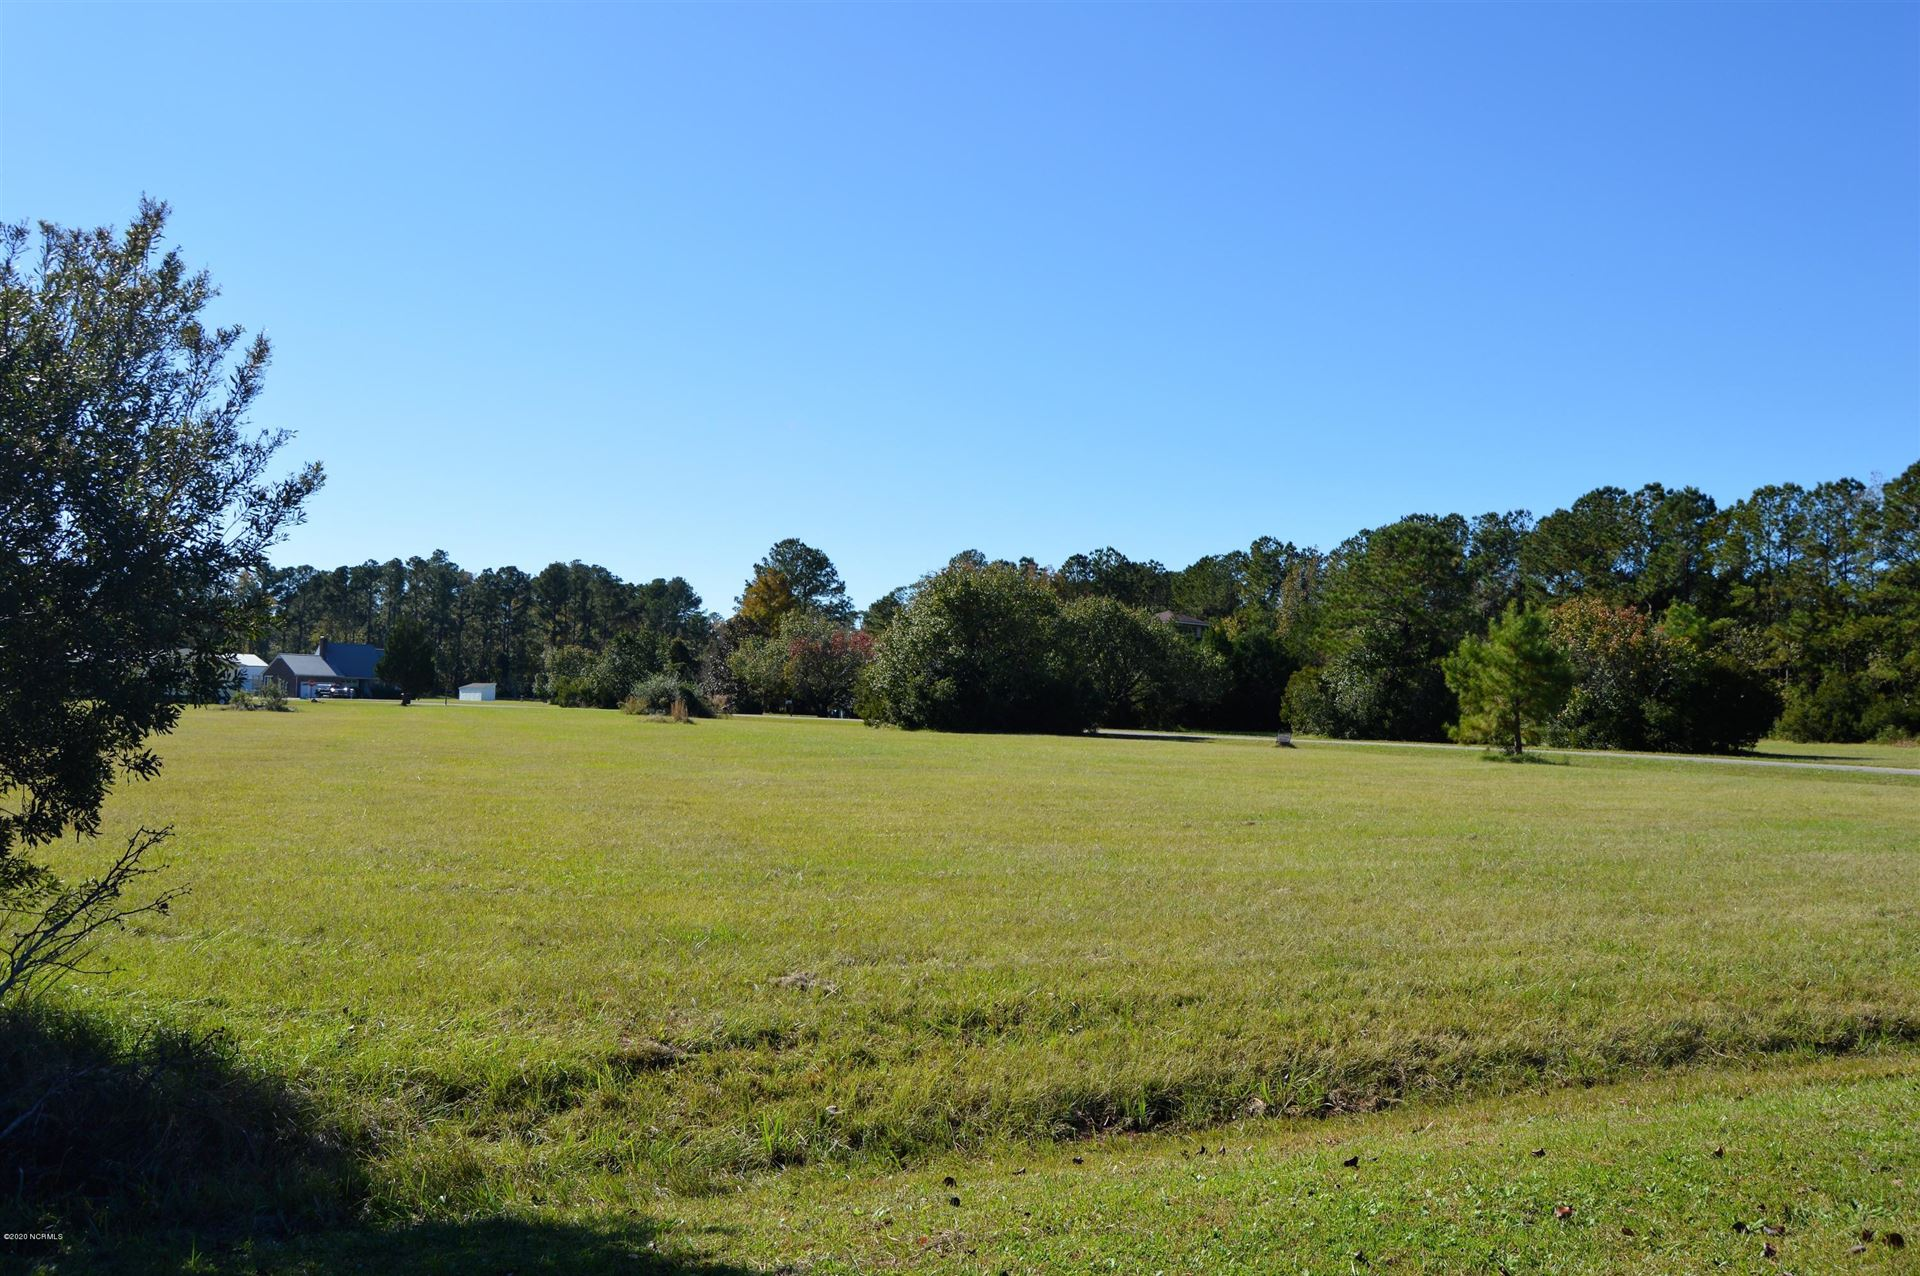 Photo of 1002 Pirate Cove Circle, Oriental, NC 28571 (MLS # 100246215)